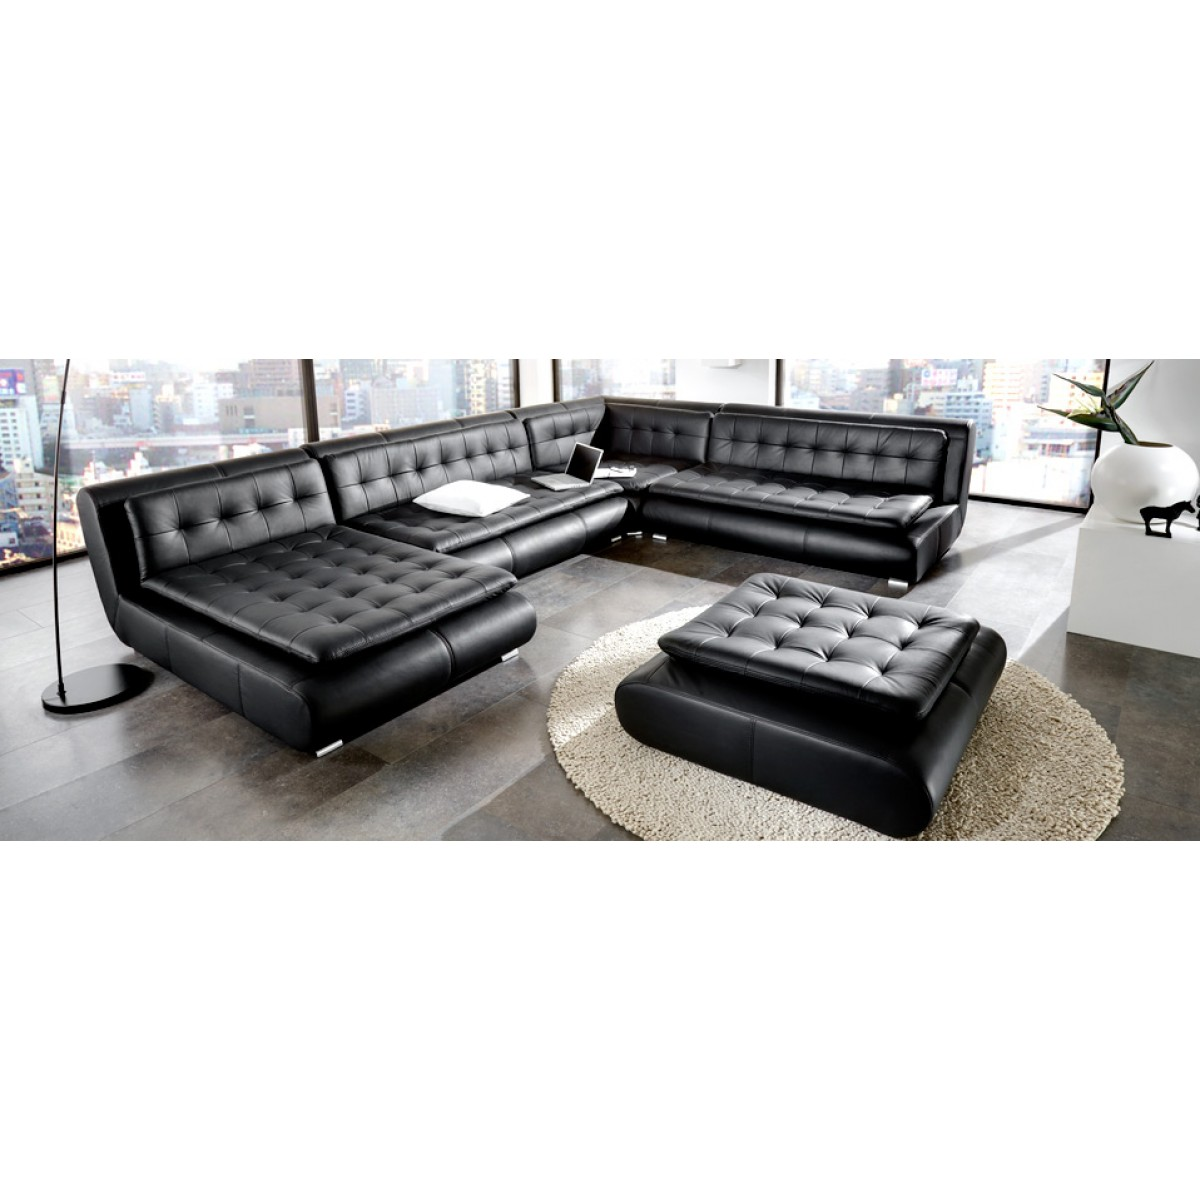 canap d 39 angle panoramique en cuir design boss pop. Black Bedroom Furniture Sets. Home Design Ideas